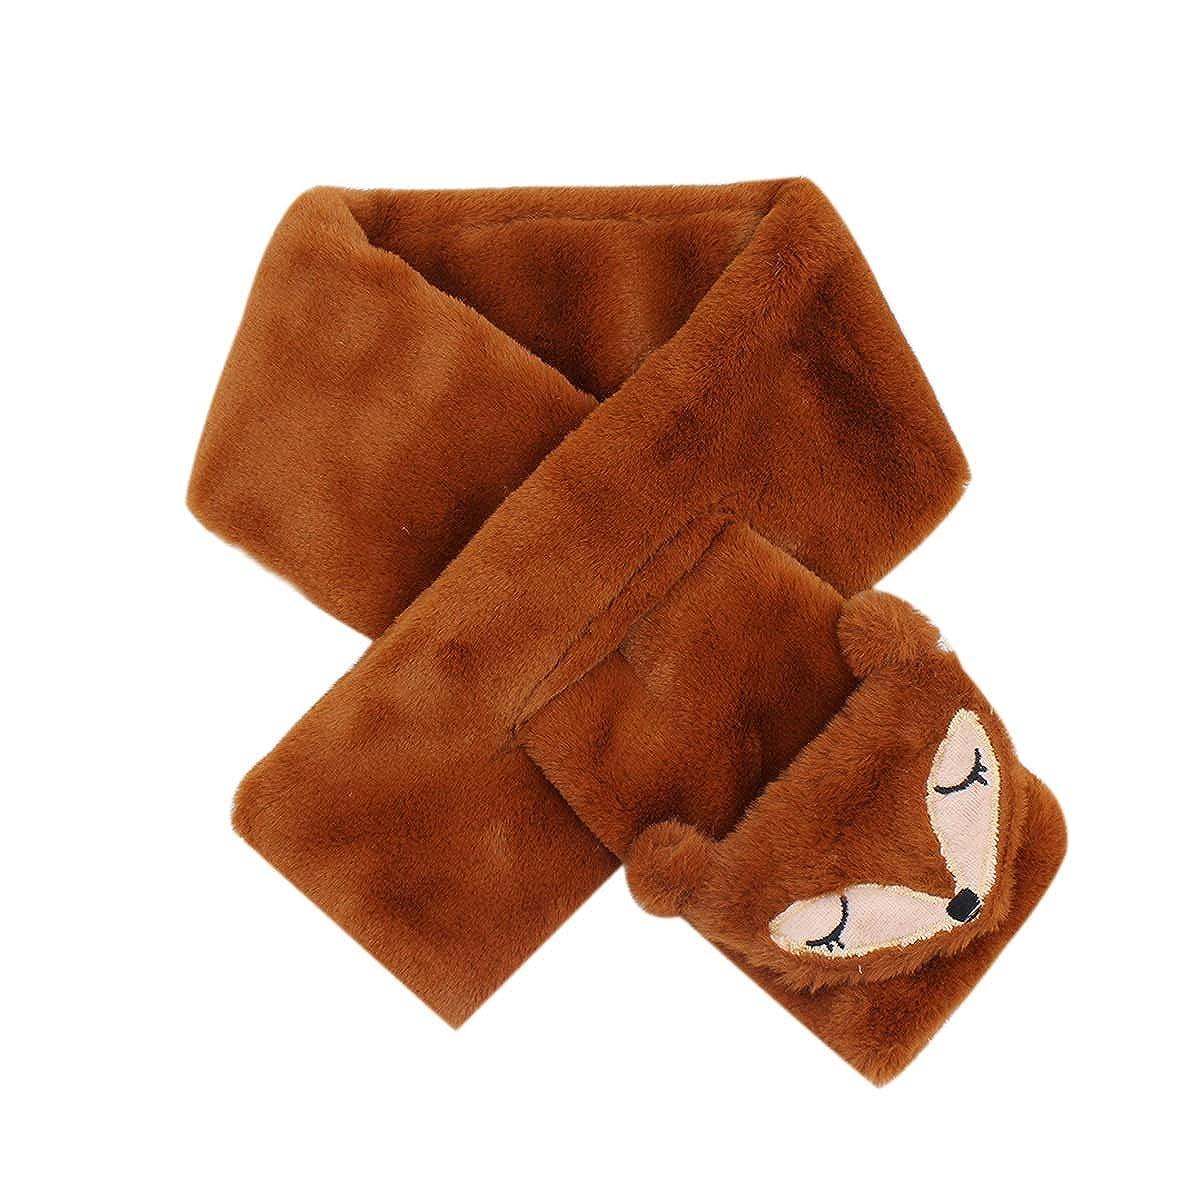 Baby Kids Coral Fleece Winter Scarf Cross Tie Collar Neck Wrap for Boys Girls